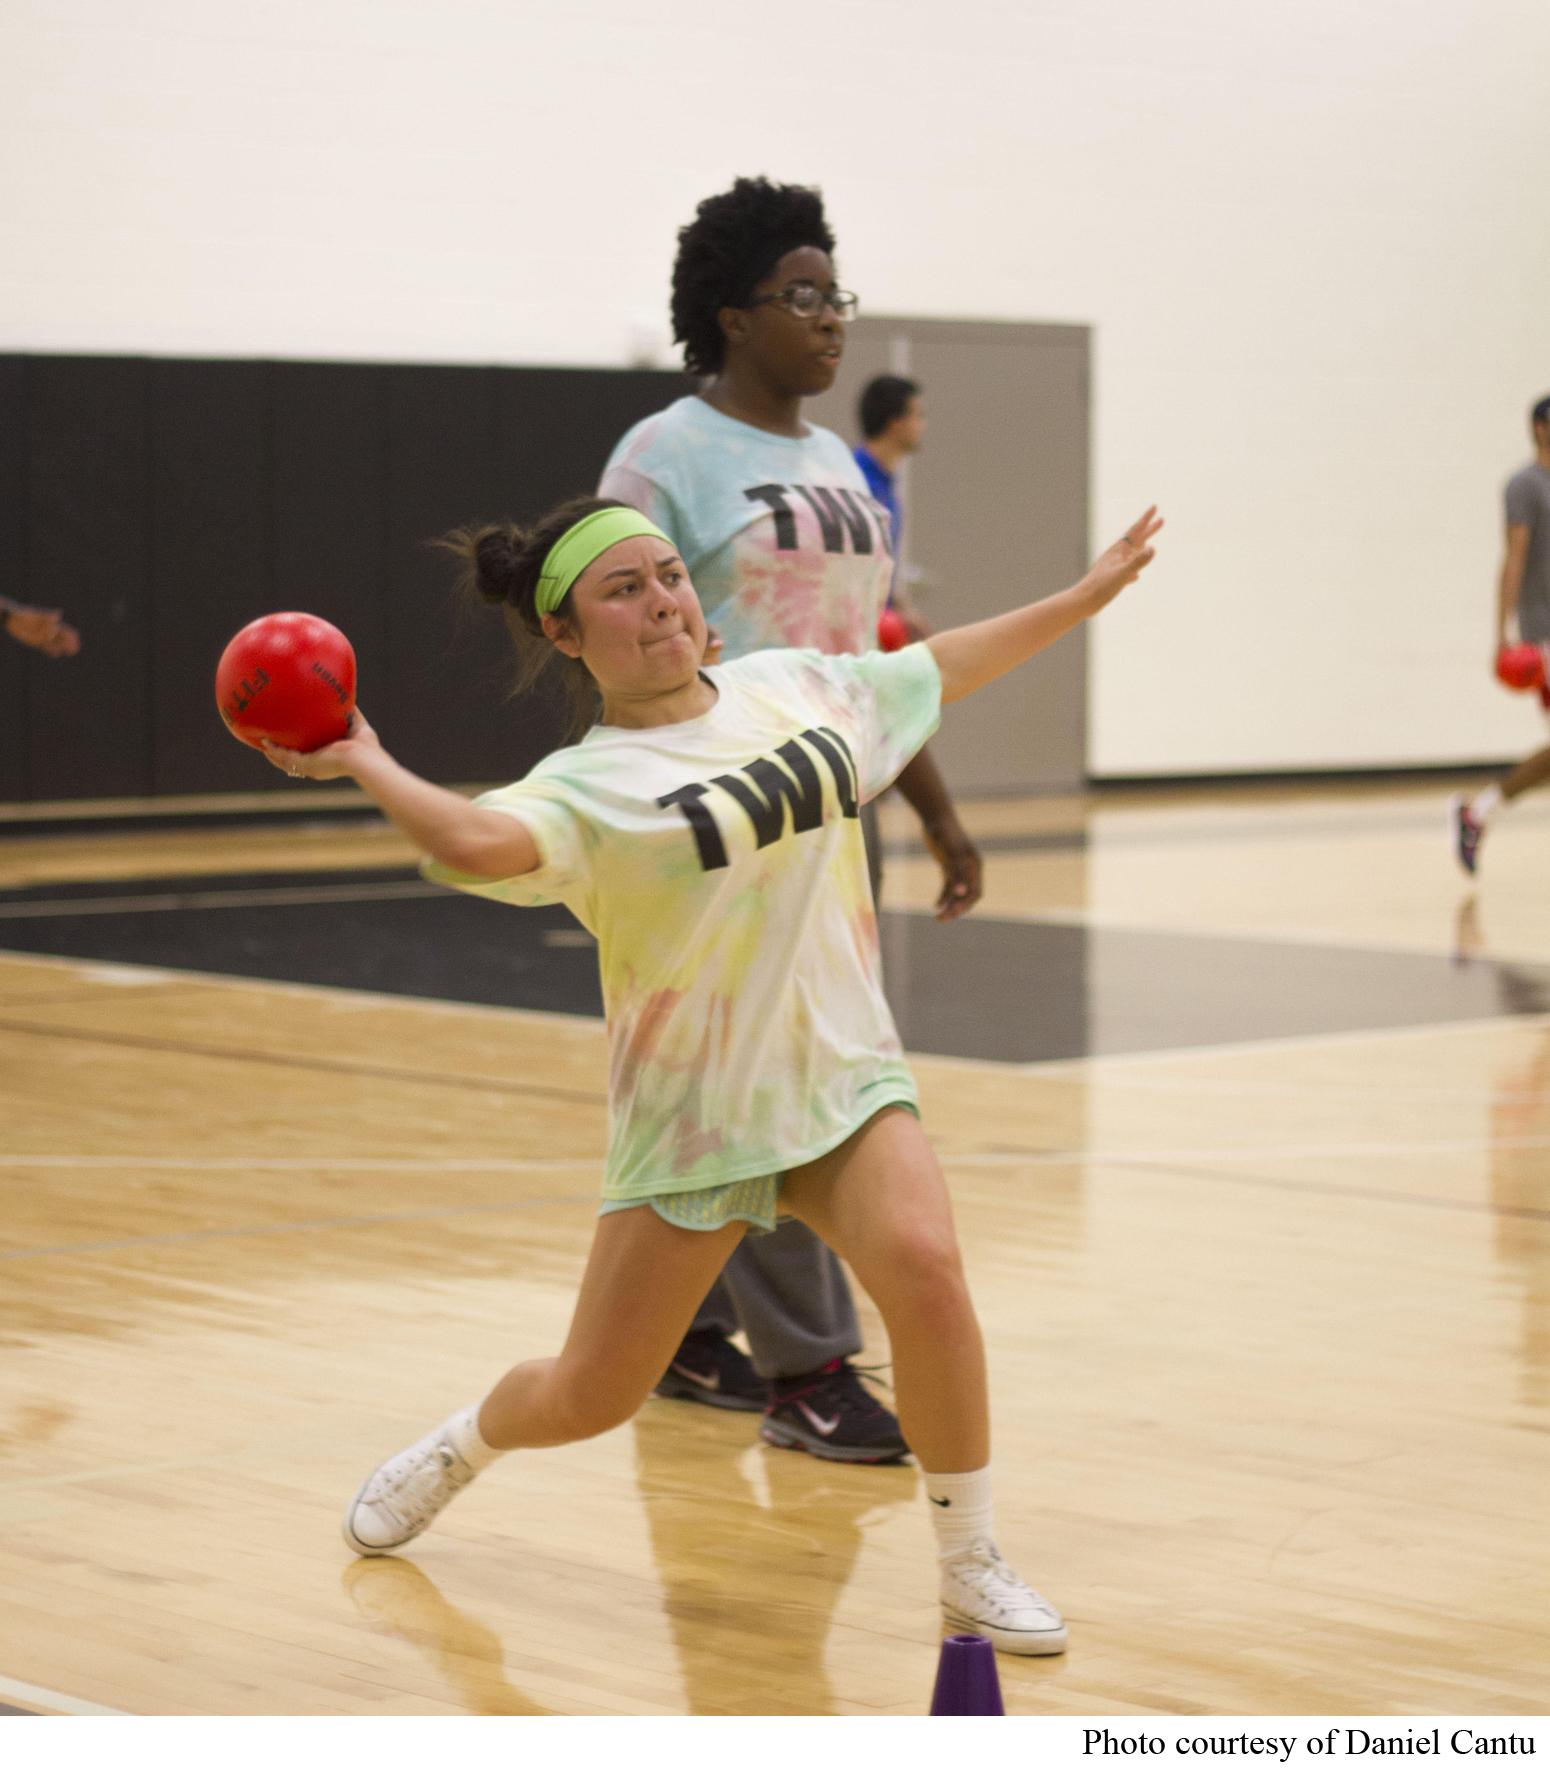 TWU students enjoy an intense game of intramural dodgeball.